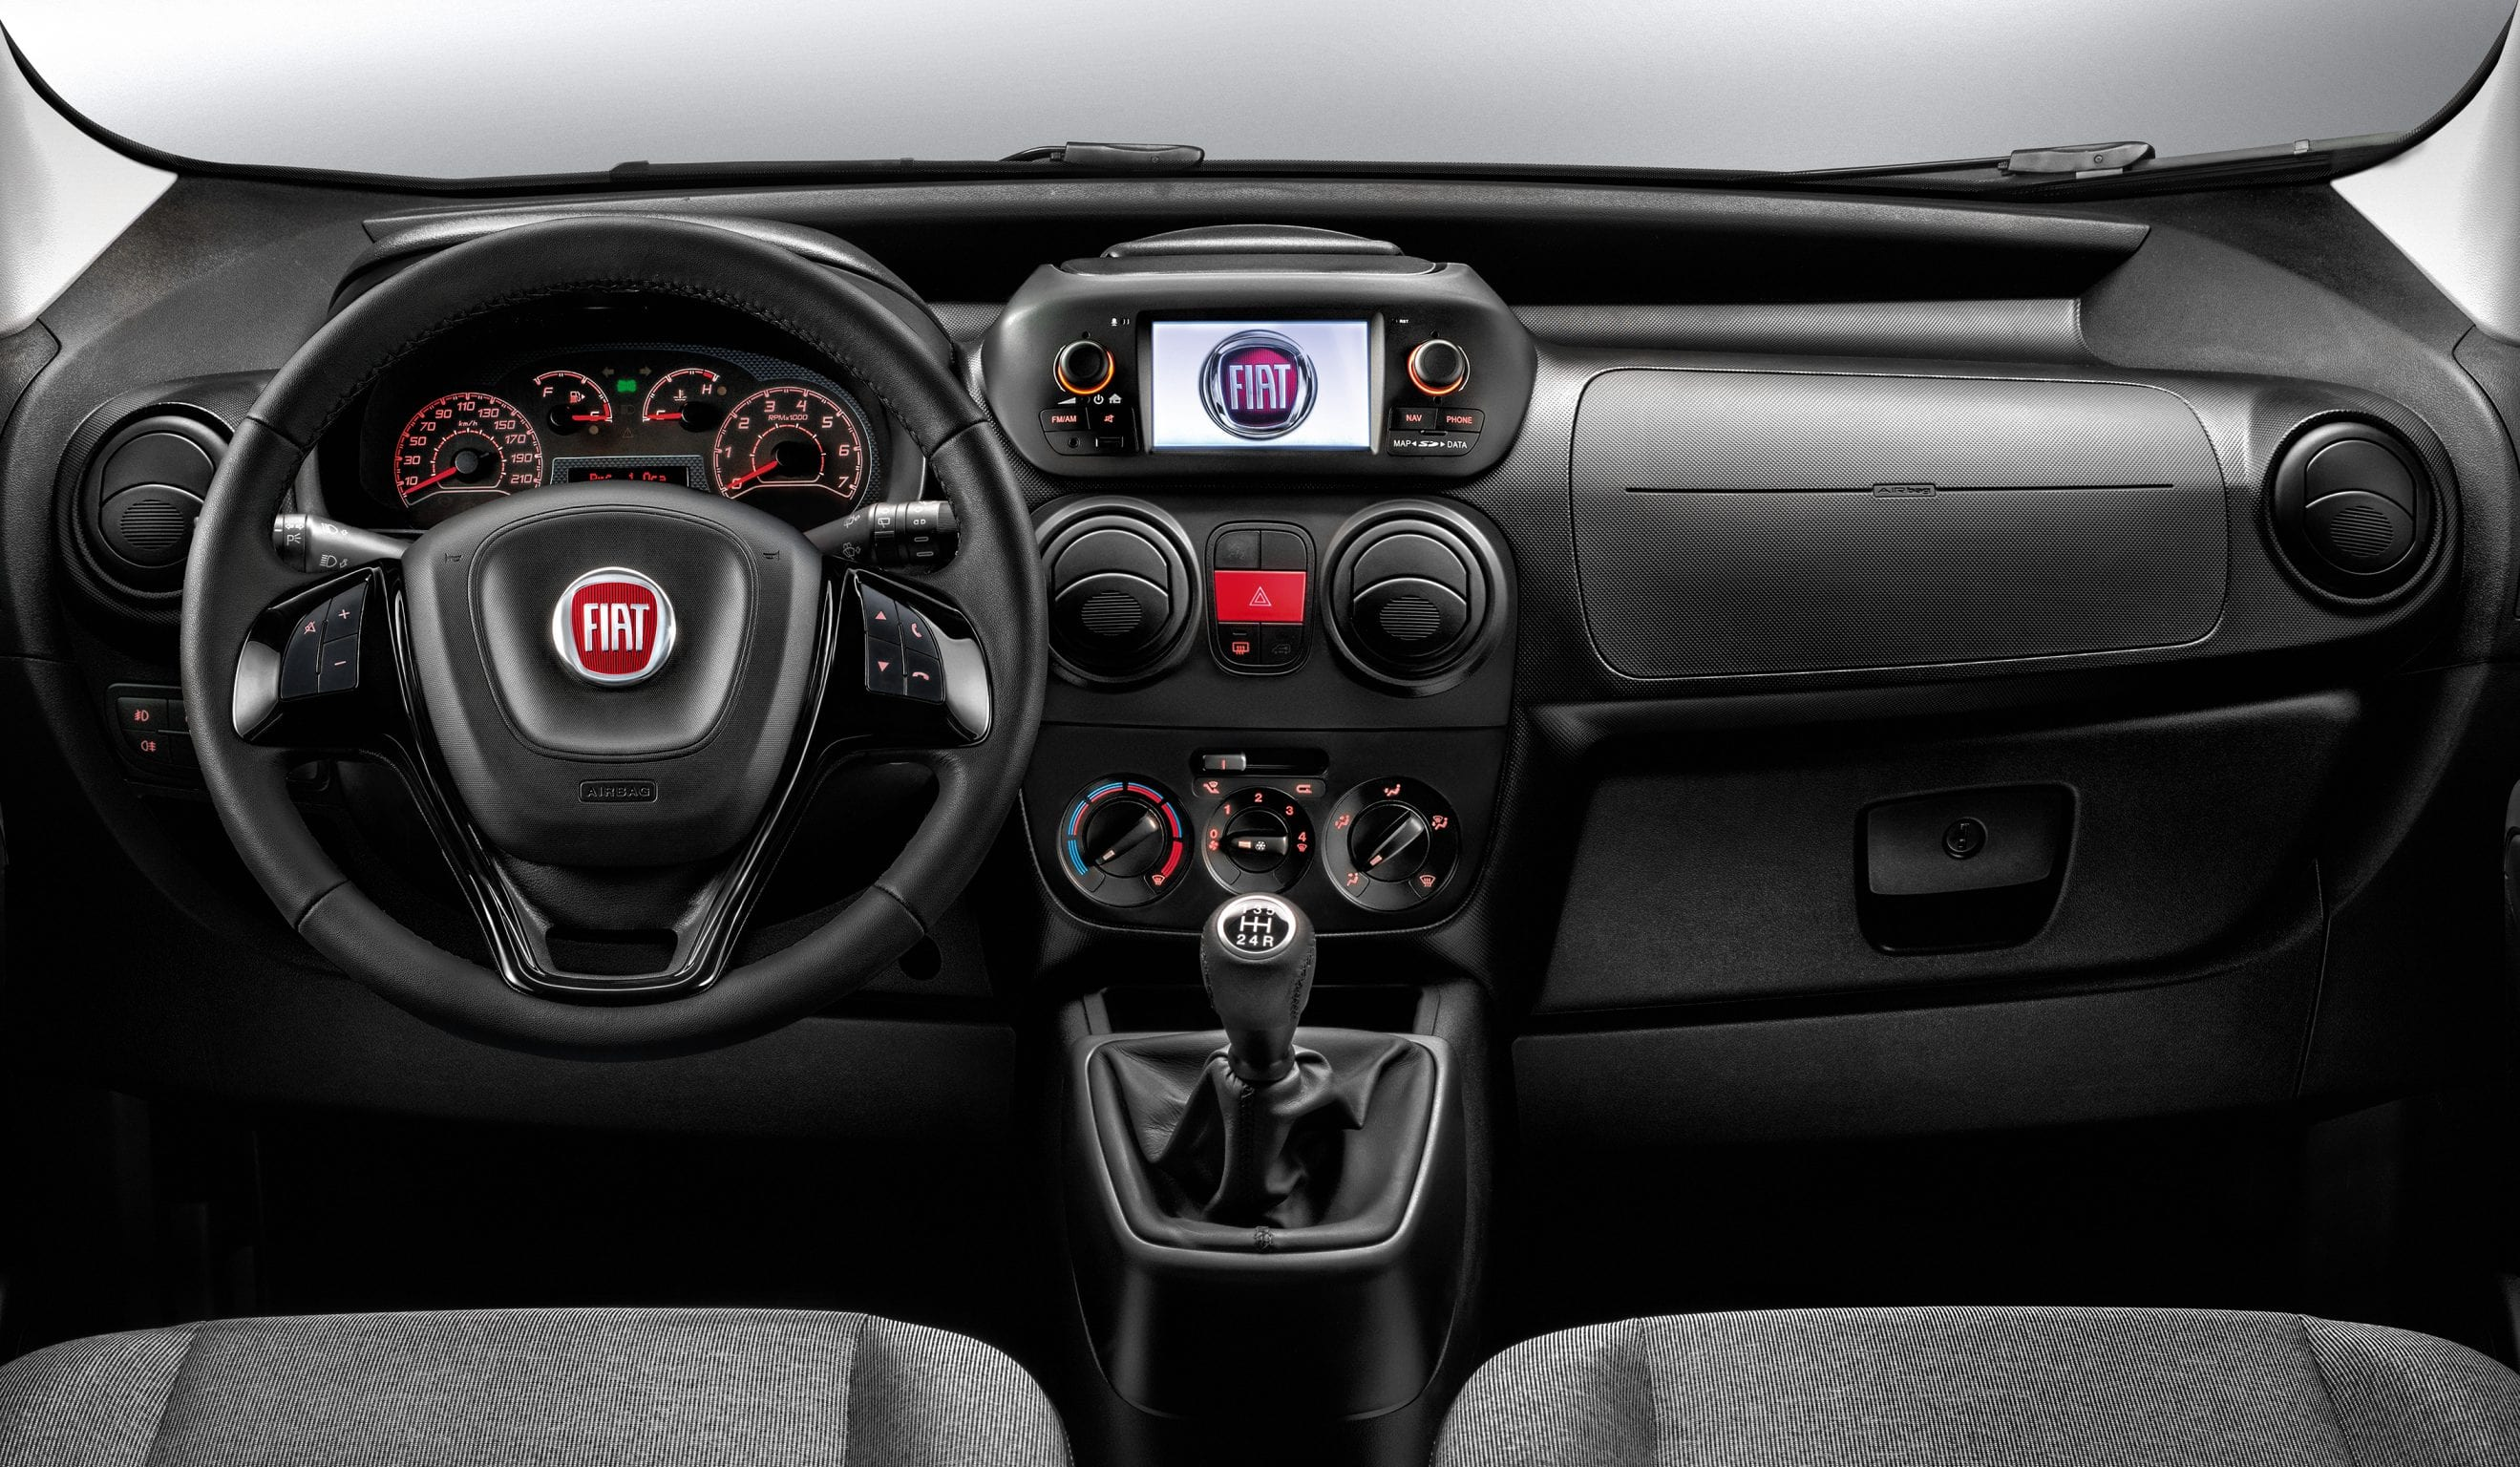 Fiat Professional Fiorino